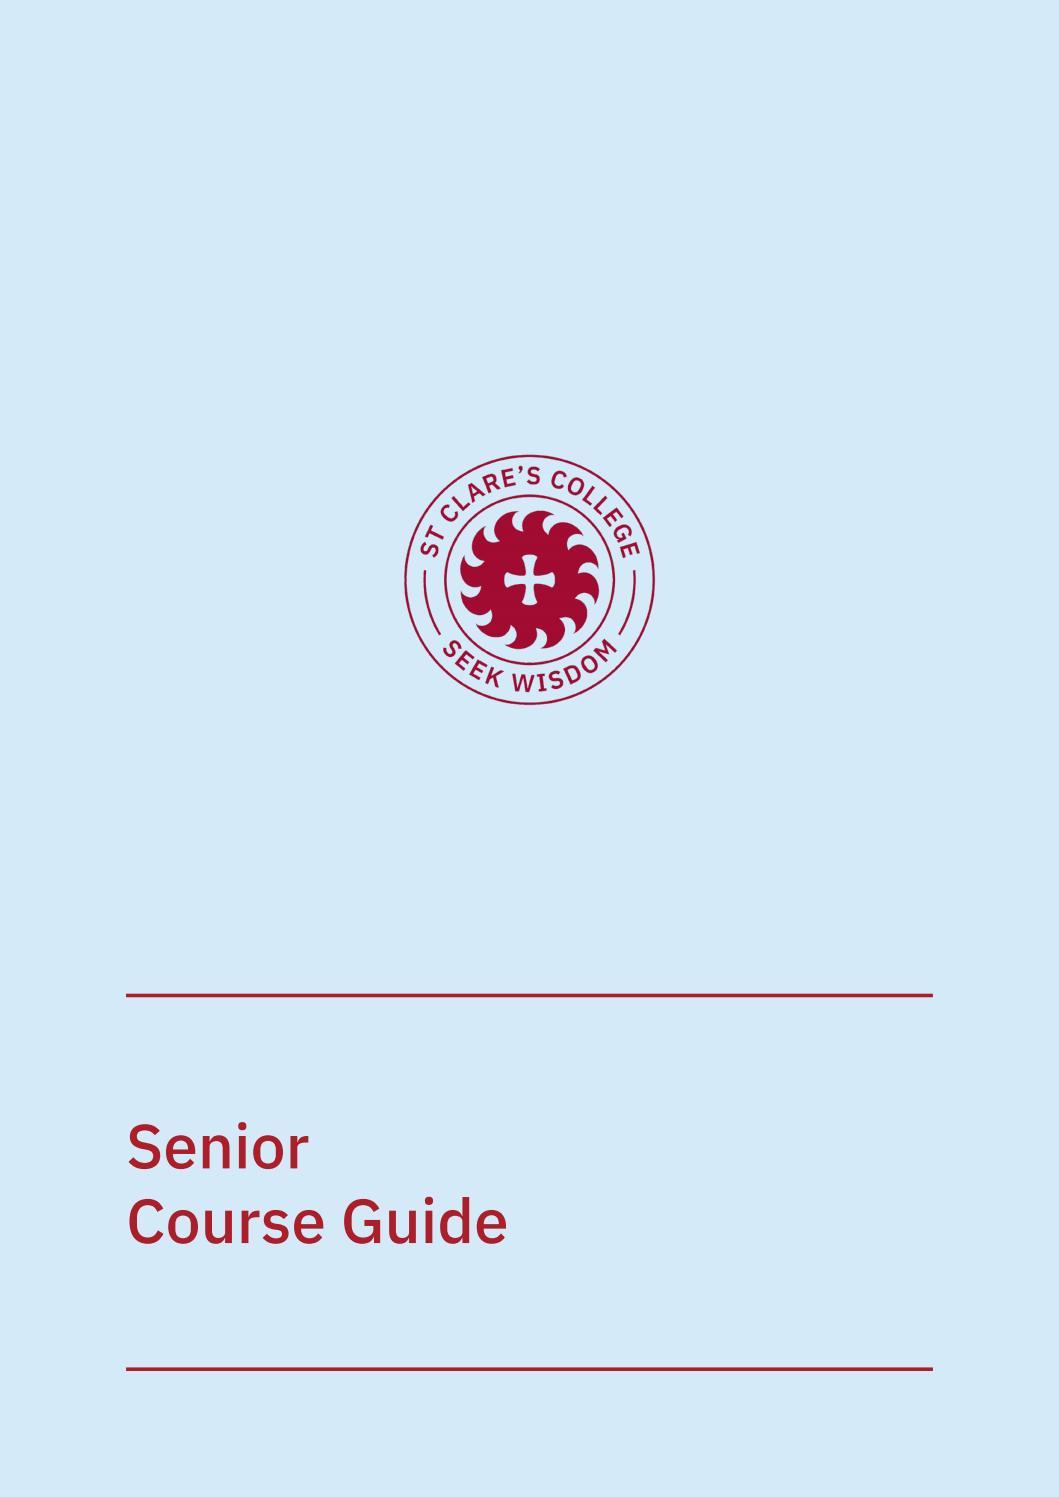 Download Senior Course Guide